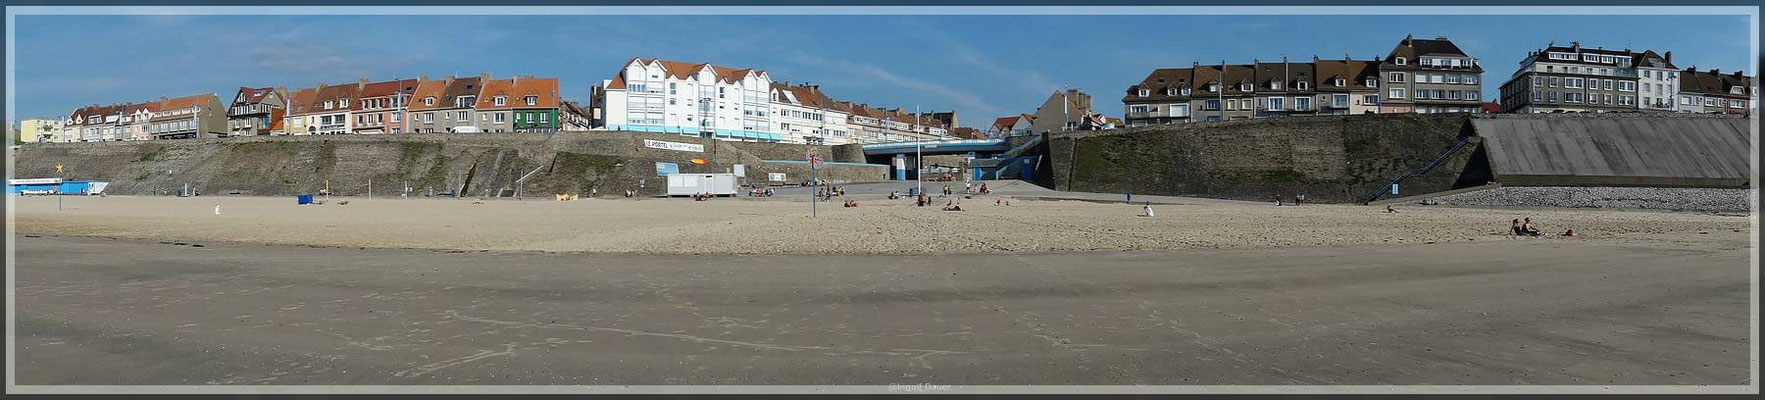 Strand bei Boulogne-Sur-Mer